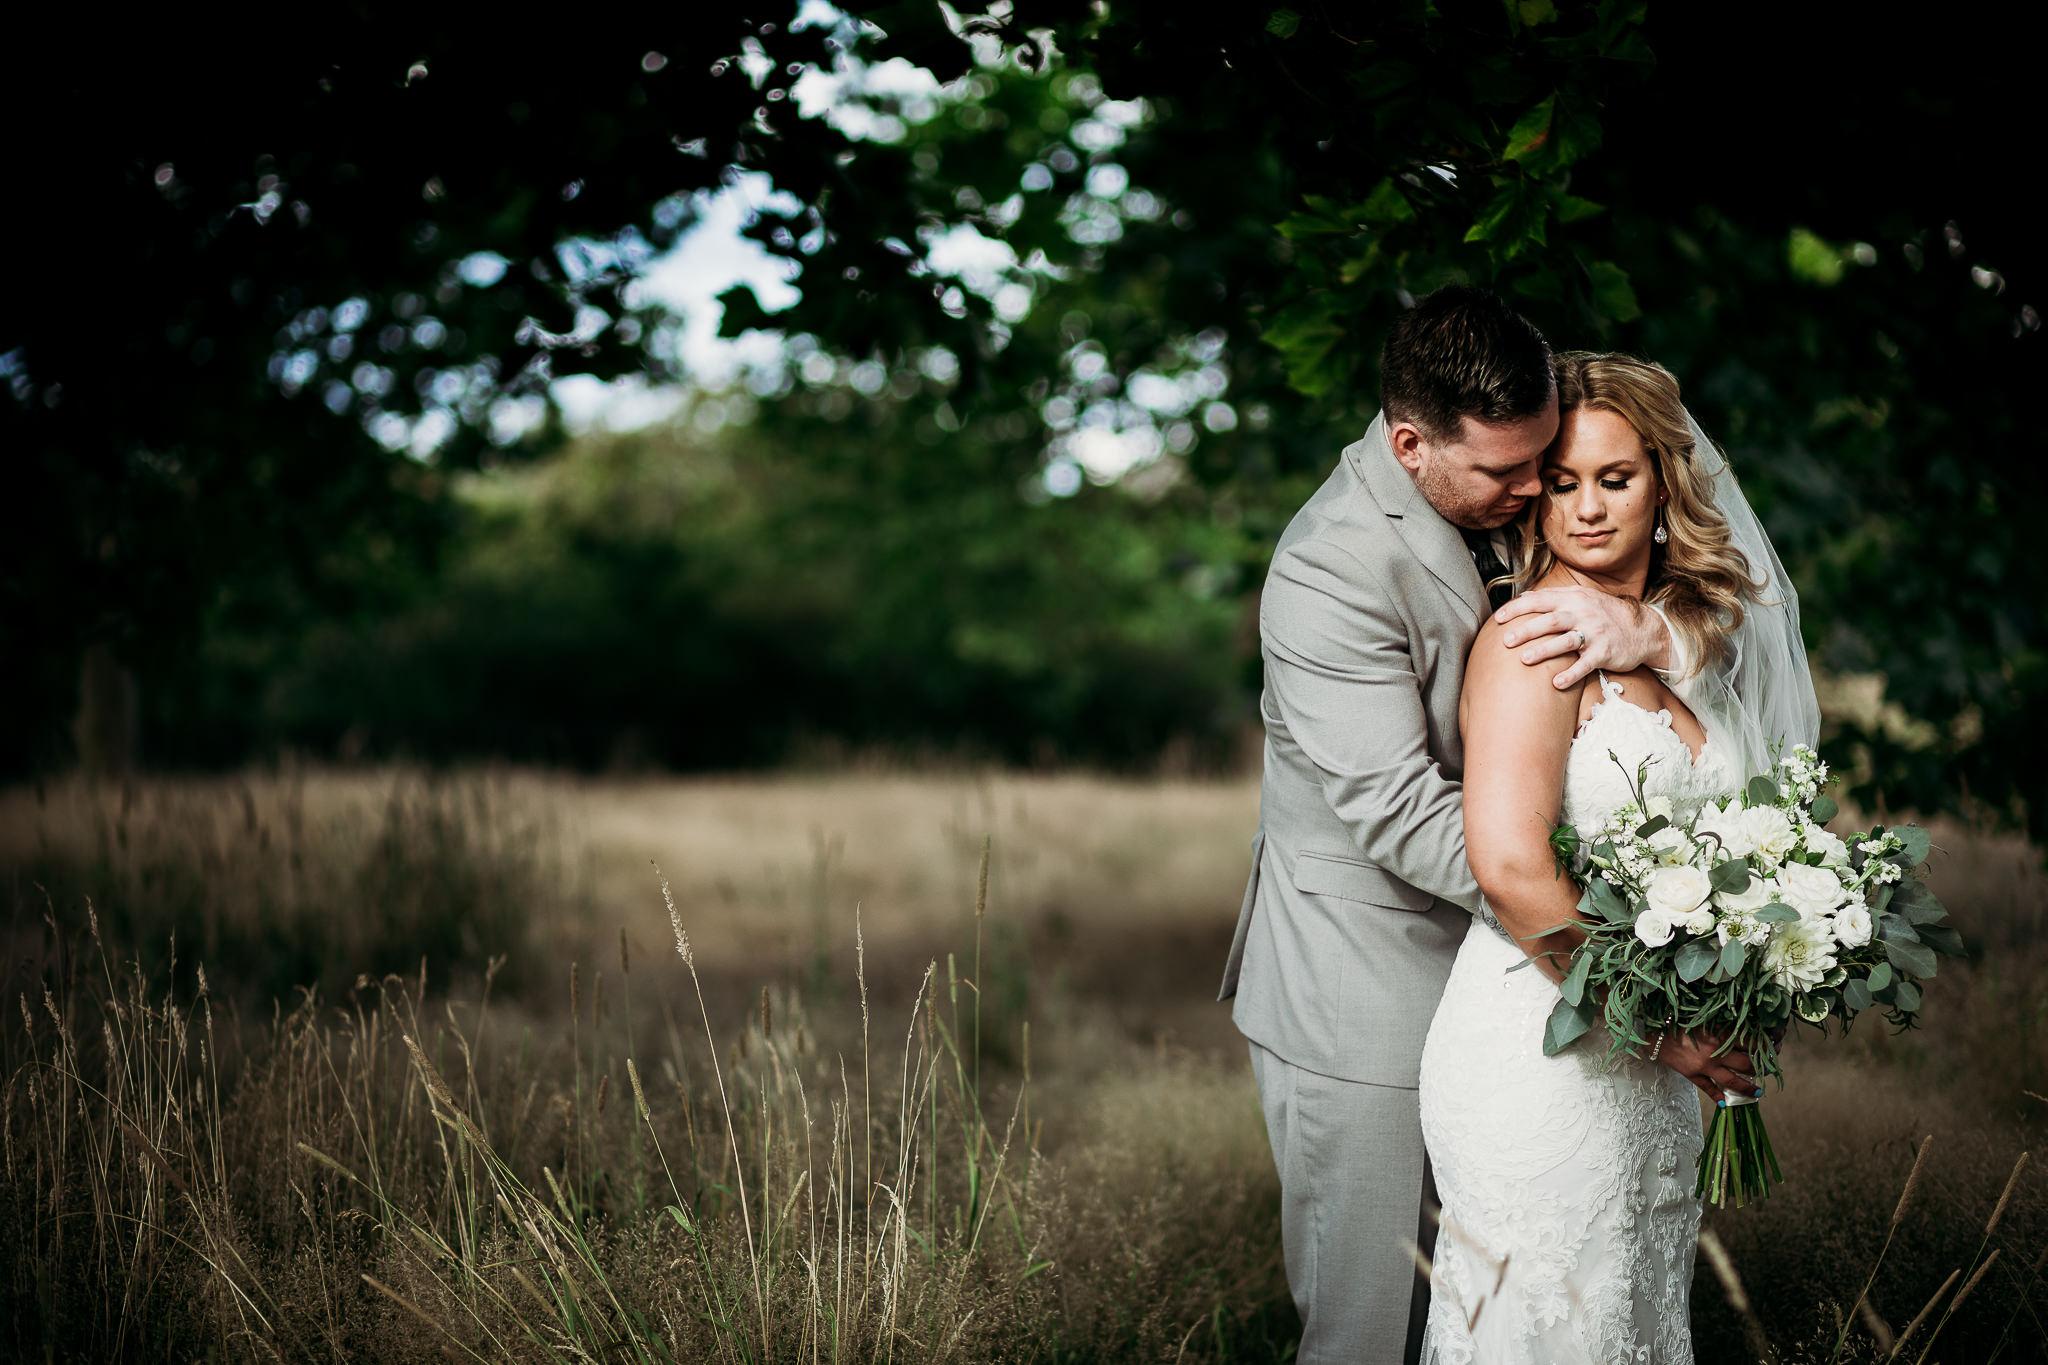 Vancouver Wedding Photographer; Abbotsford Wedding Photographer; Chilliwack Wedding Photographer; Lower Mainland Wedding Photographer; Langley Wedding Photographer